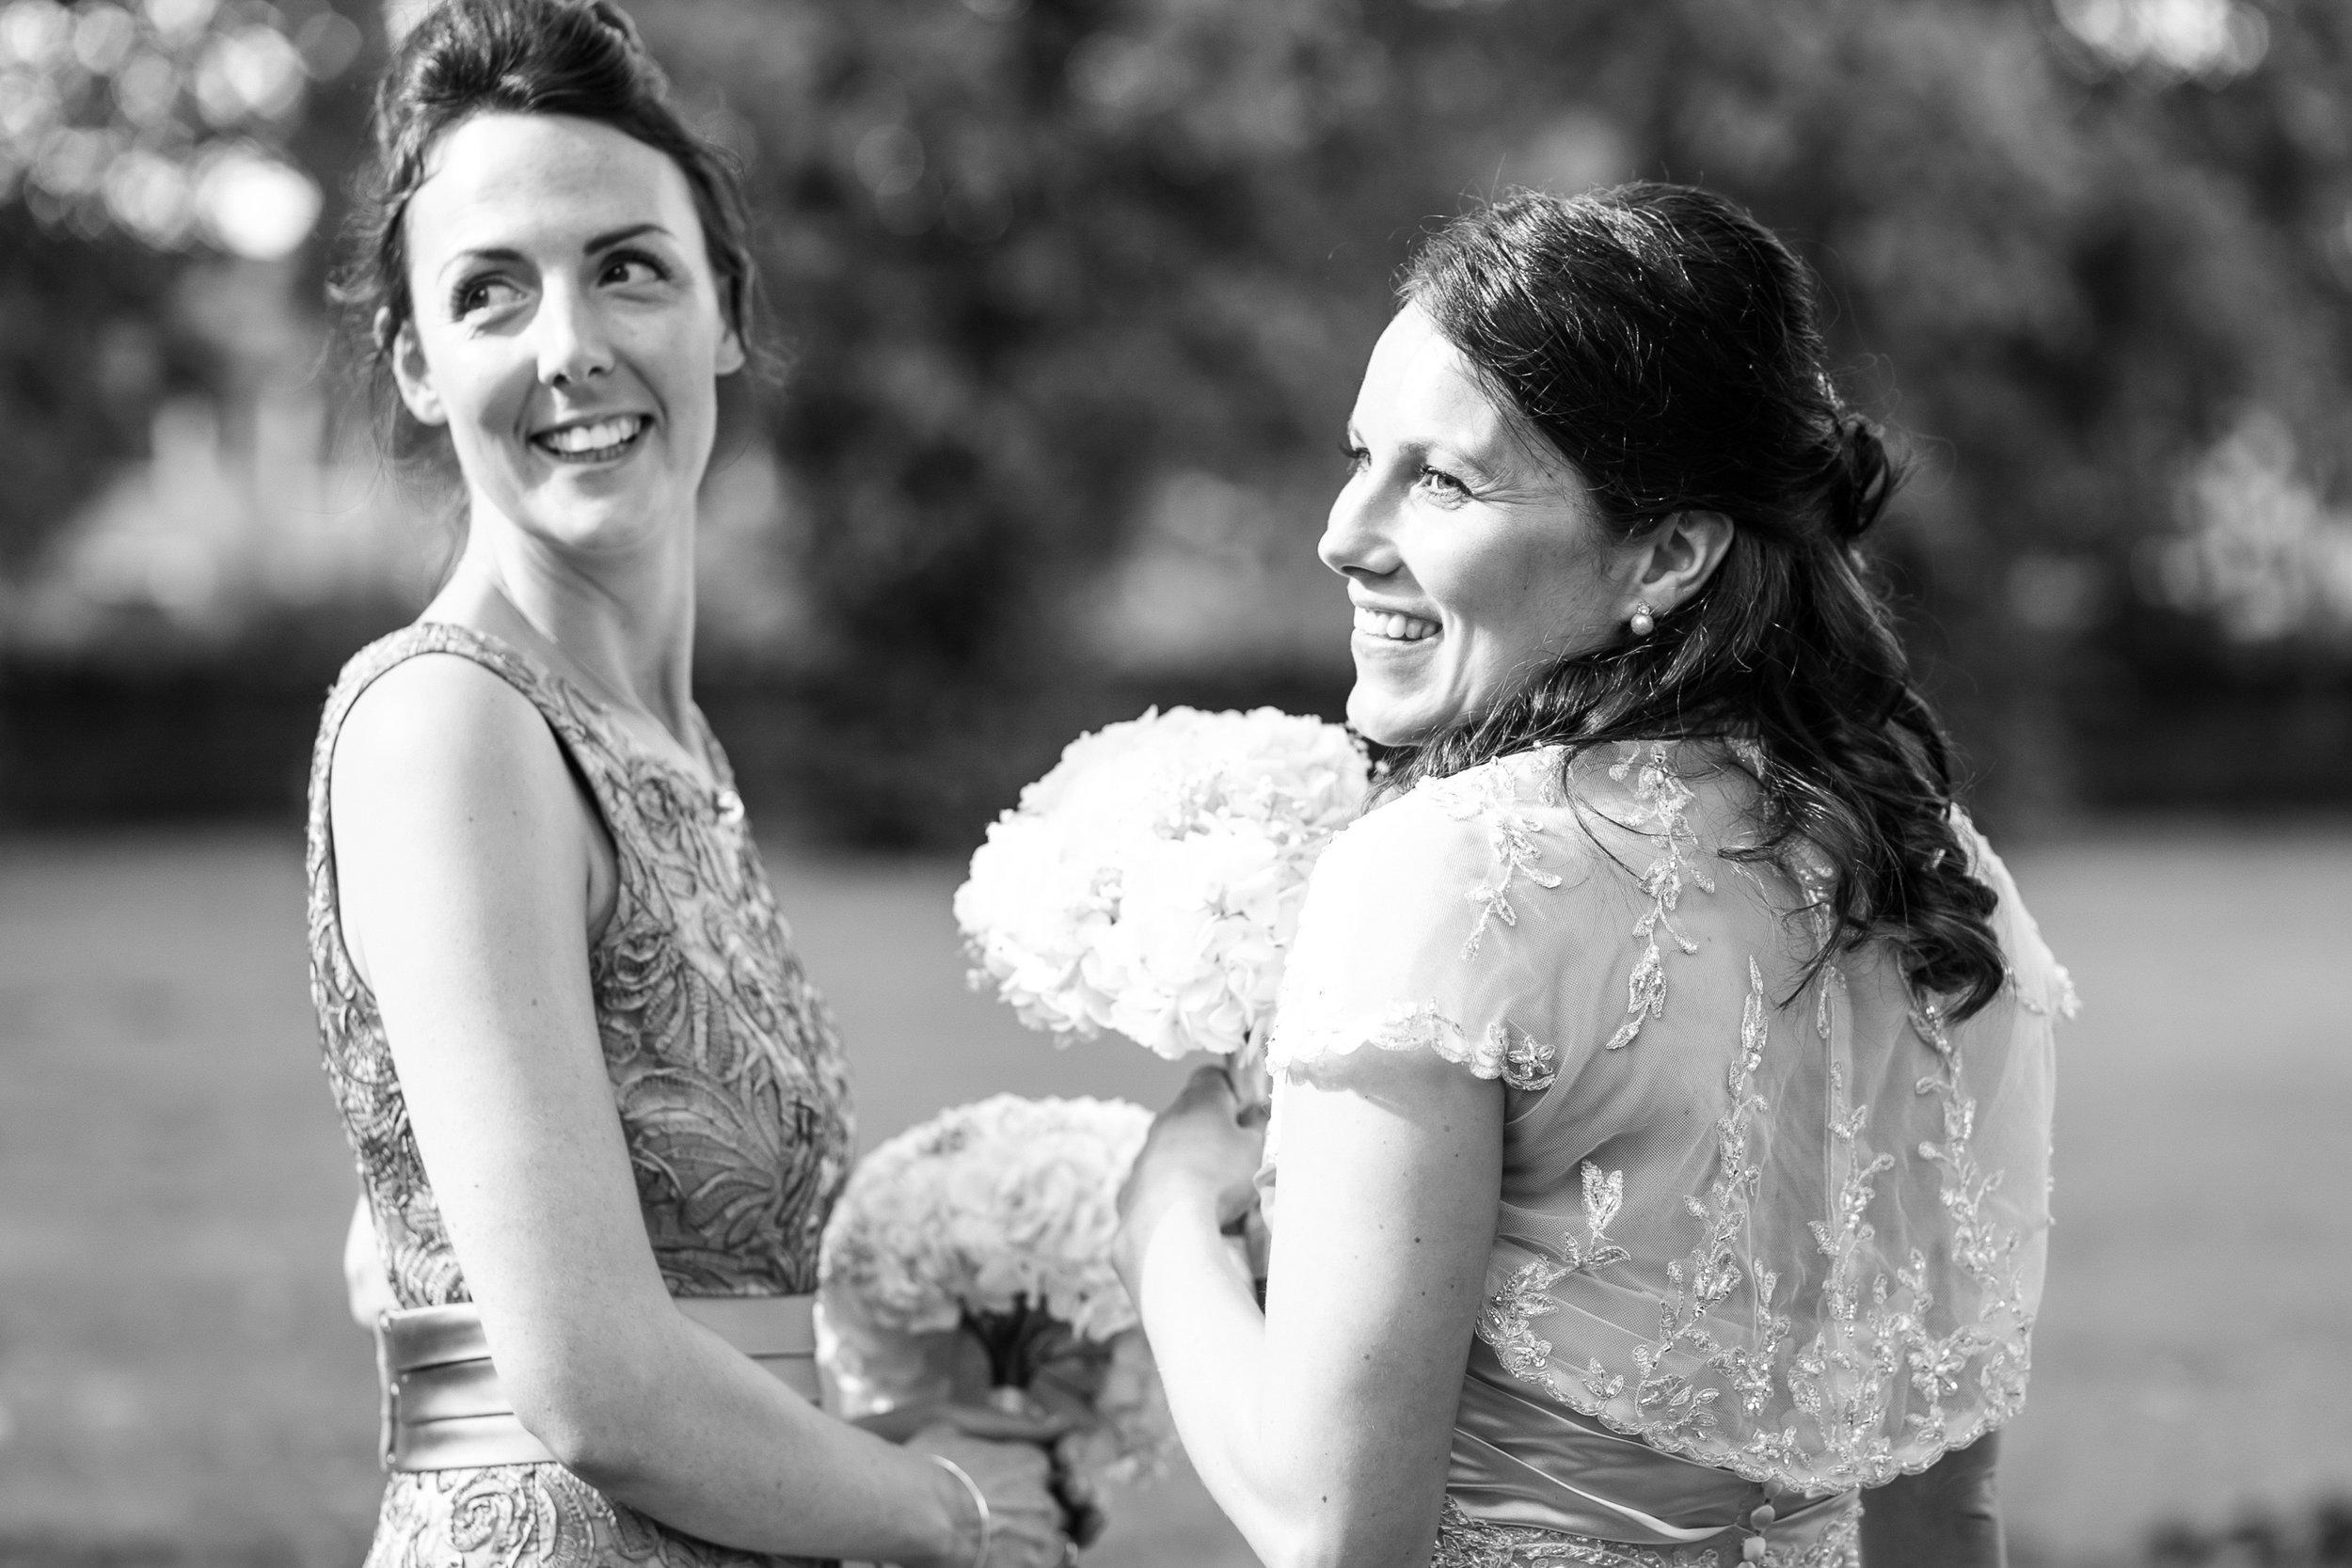 Lynsey&Paraic_B&W-175-Lynsey & Paraic-Bashall Eaves-Wedding-Lancashire-photo.jpg